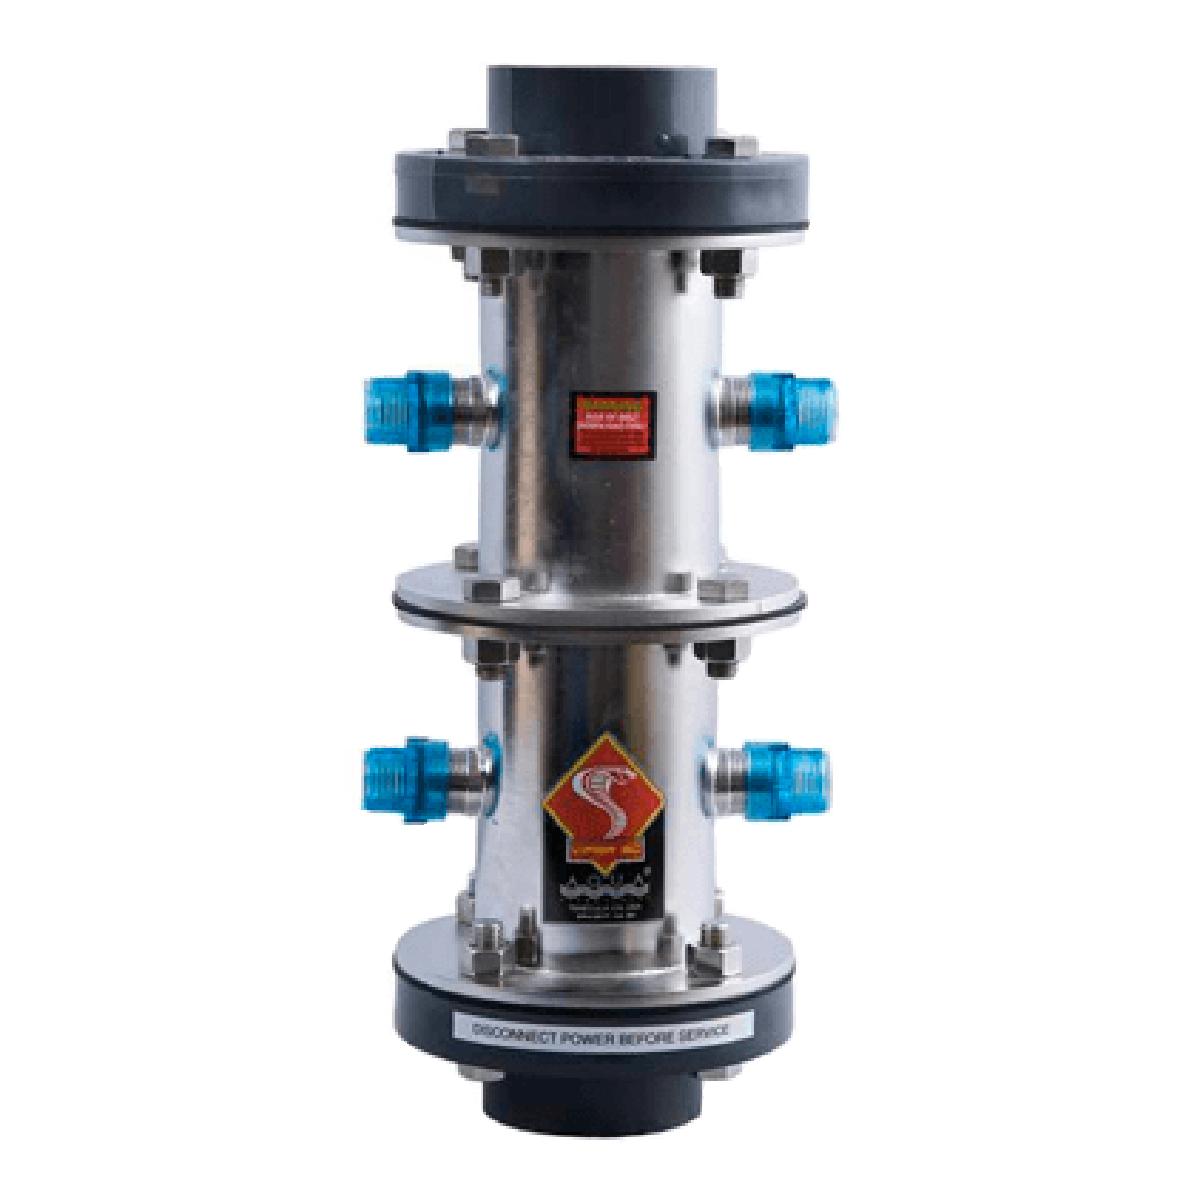 Viper Sl 800 Watt Stainless Steel%E2%80%8B image